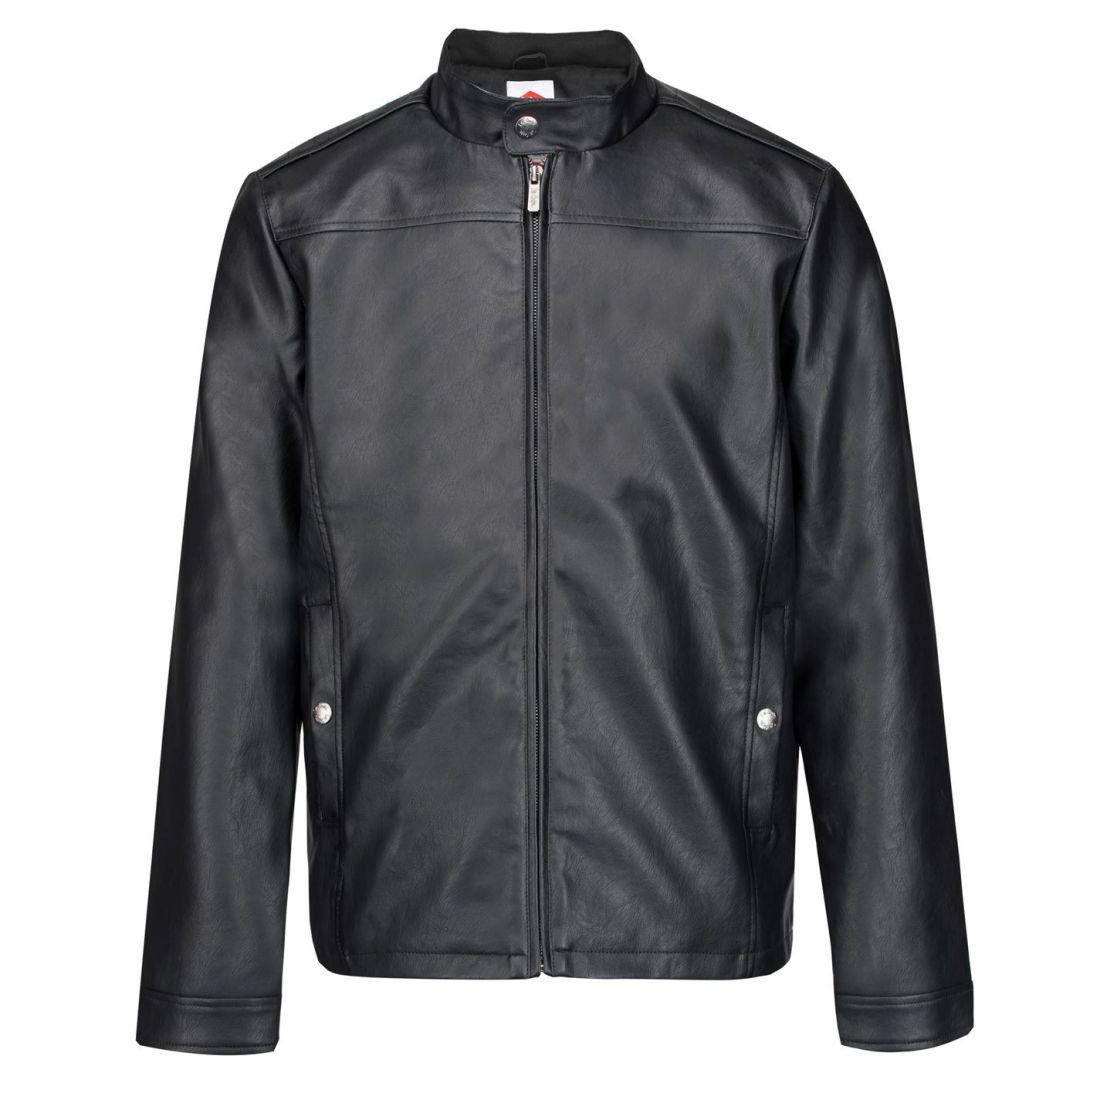 85d53005a Details about Lee Cooper PU Biker Jacket Mens Gents Leather Coat Top